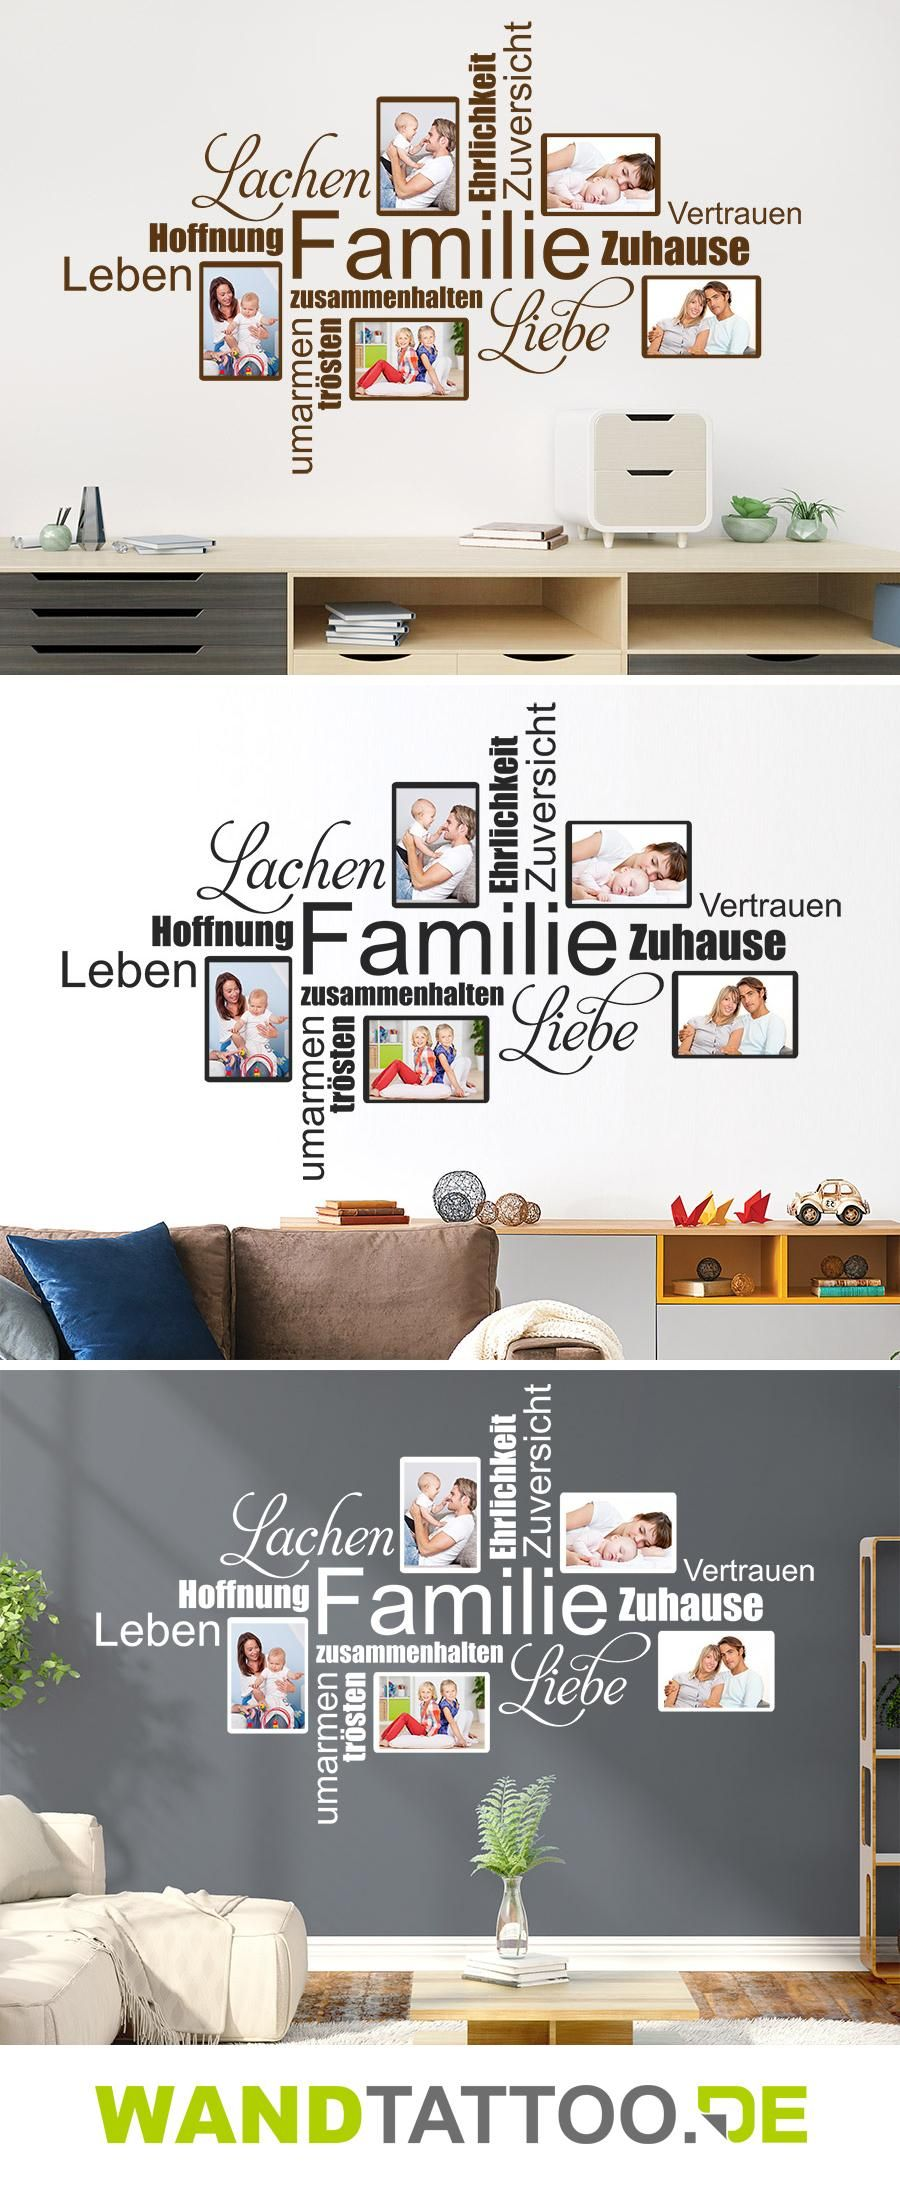 Einfache home-office-design-idee fotorahmen wortwolke familie  einrichtung  pinterest  wand wand